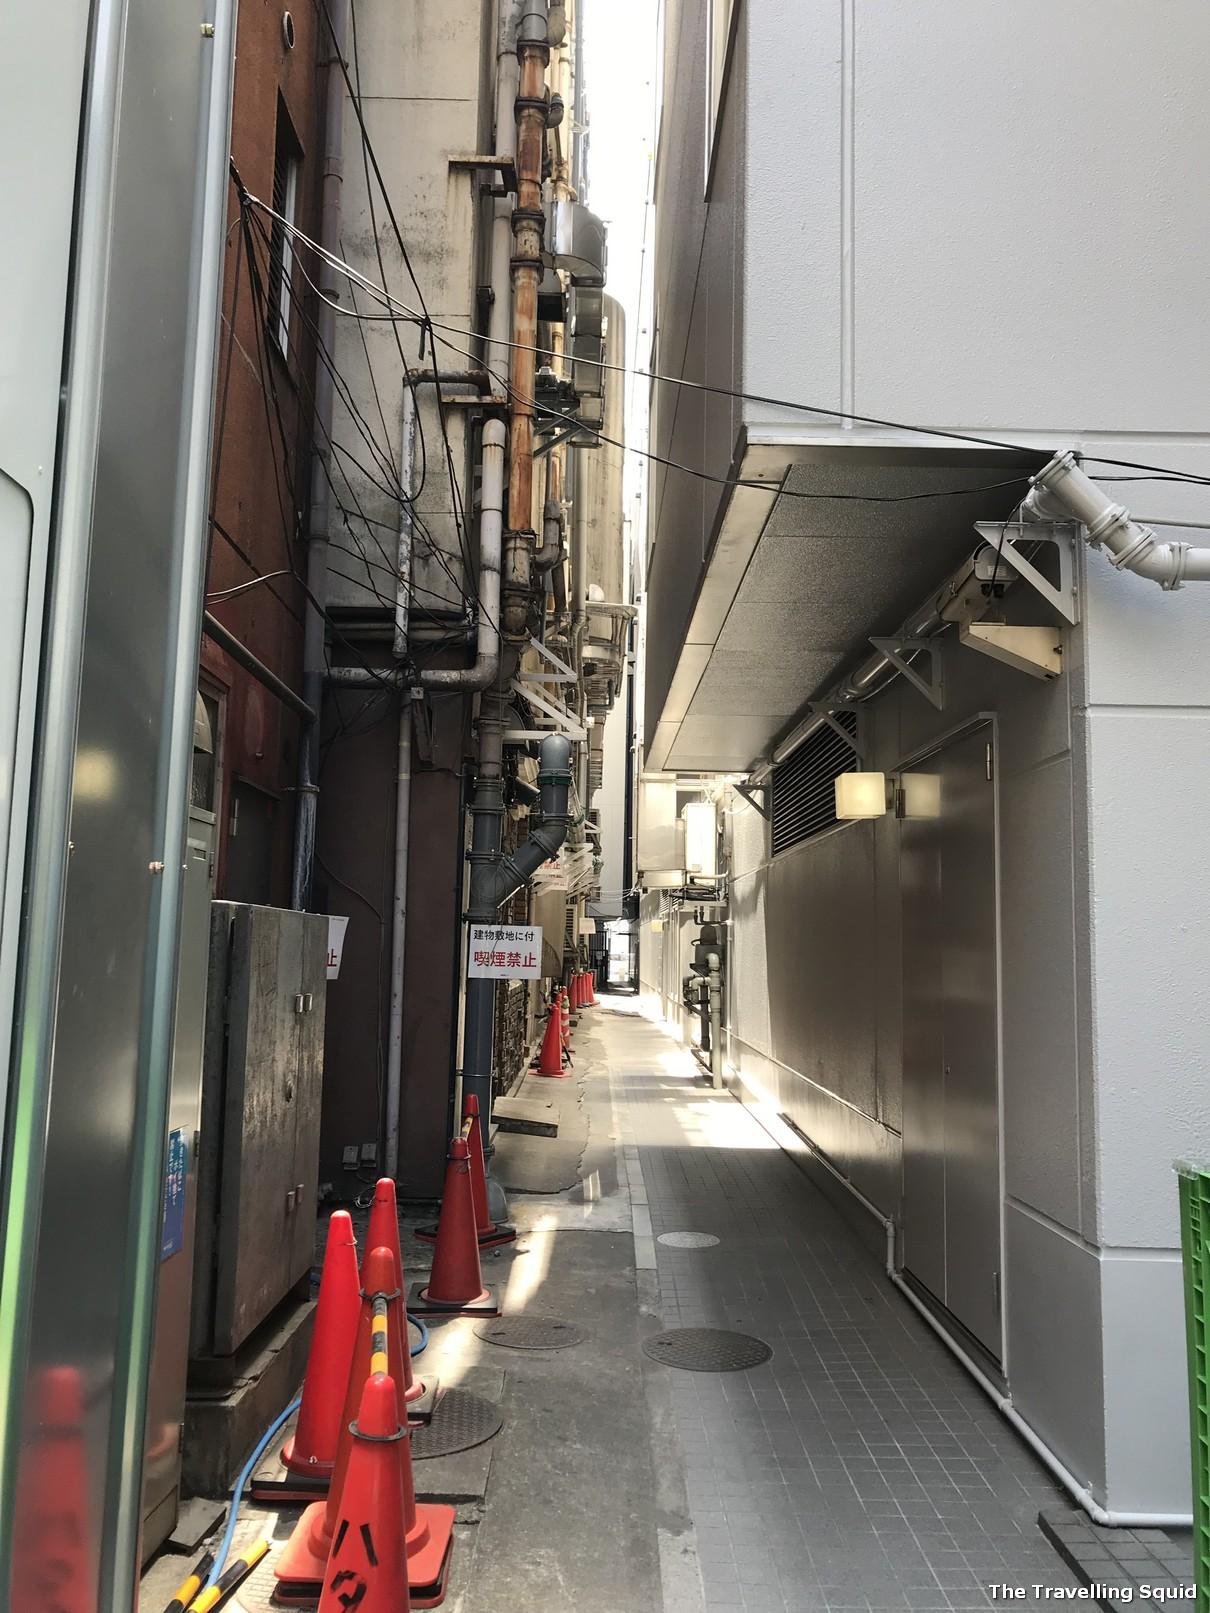 sea bream ramen at Menya Maishi in Ginza Tokyo back alley